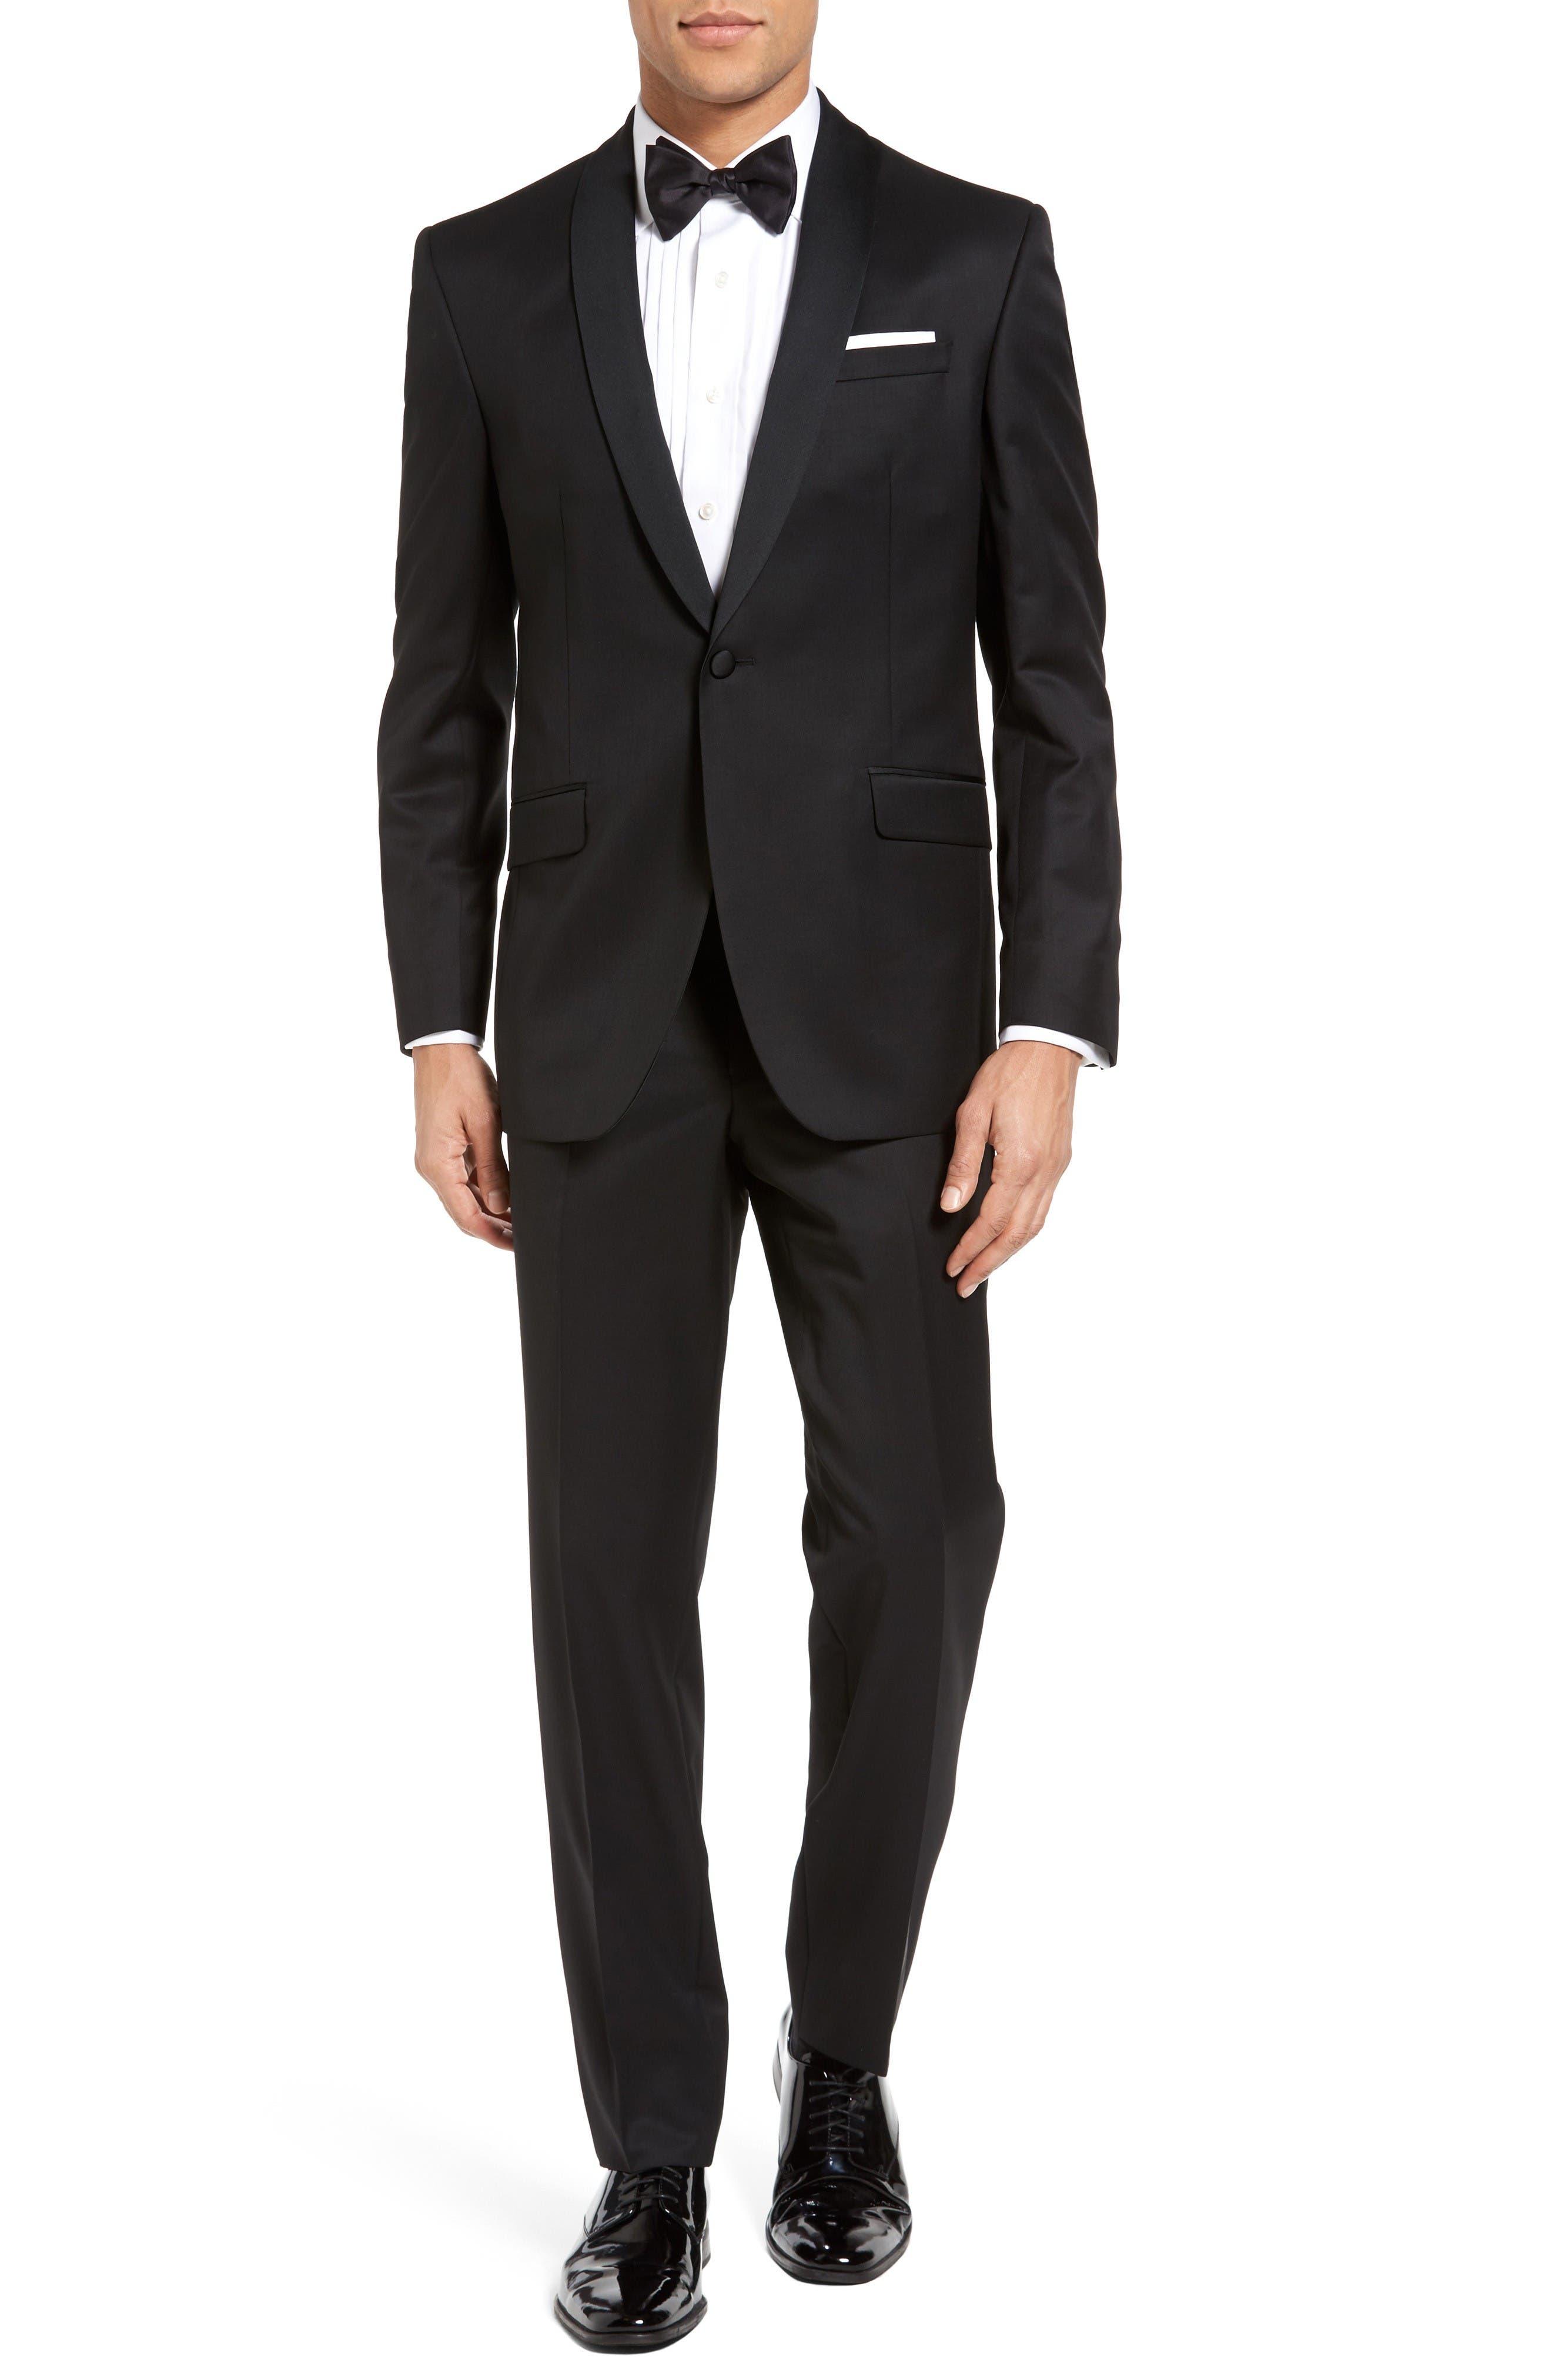 Josh Trim Fit Wool & Mohair Tuxedo,                         Main,                         color, Black